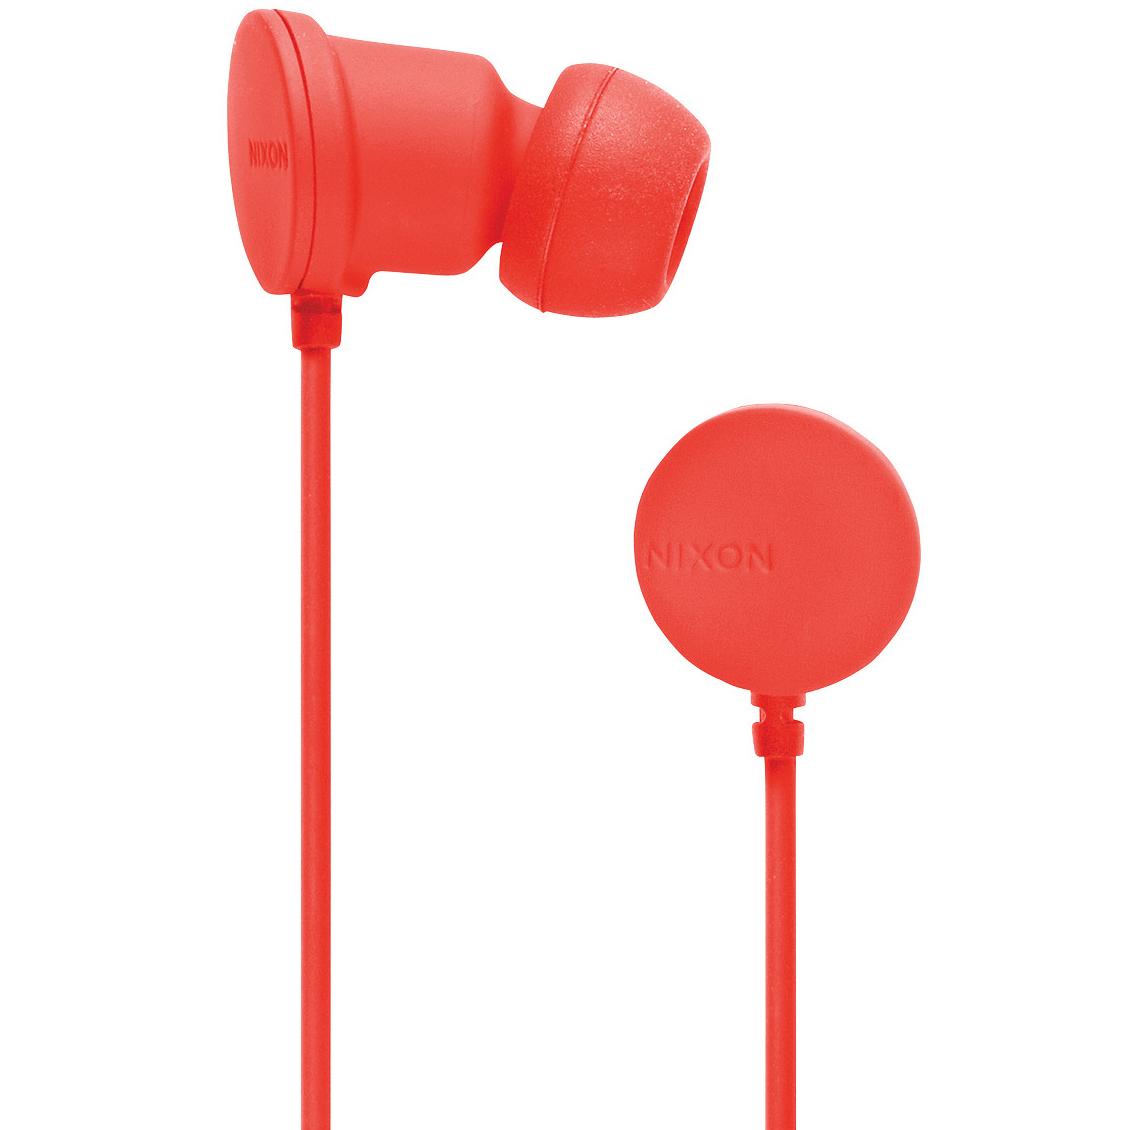 Наушники NIXON Wire Mic II Matte Red Pepper (H024)